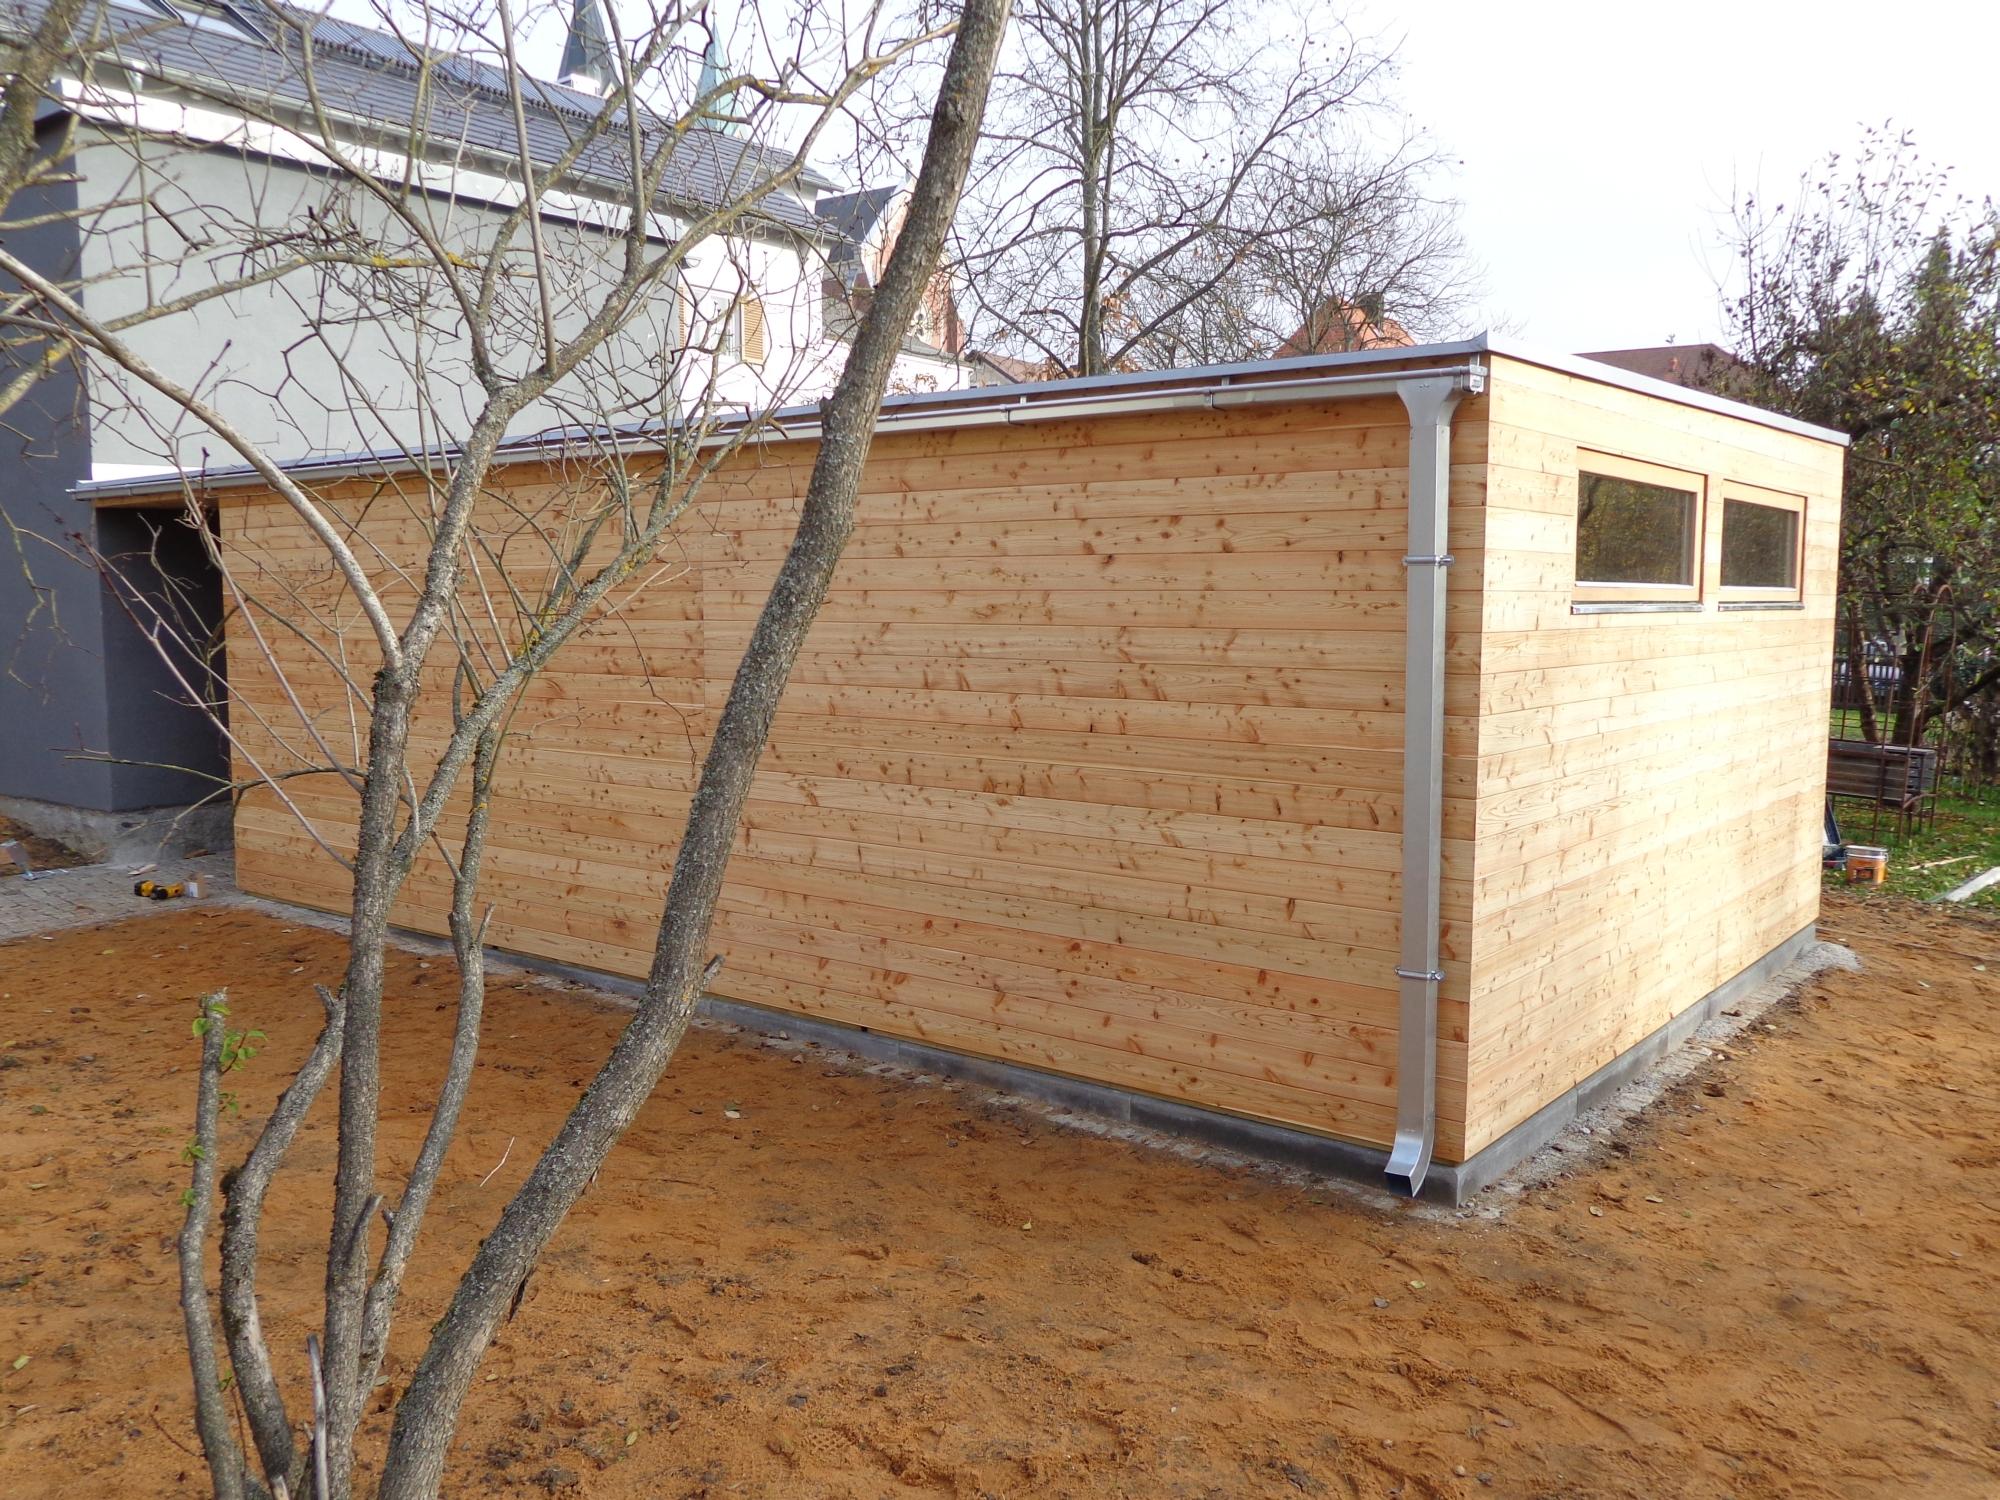 gartenhaus s24 - 4,5x6,9 m - cham - referenzen naturhouse® | naturhouse®